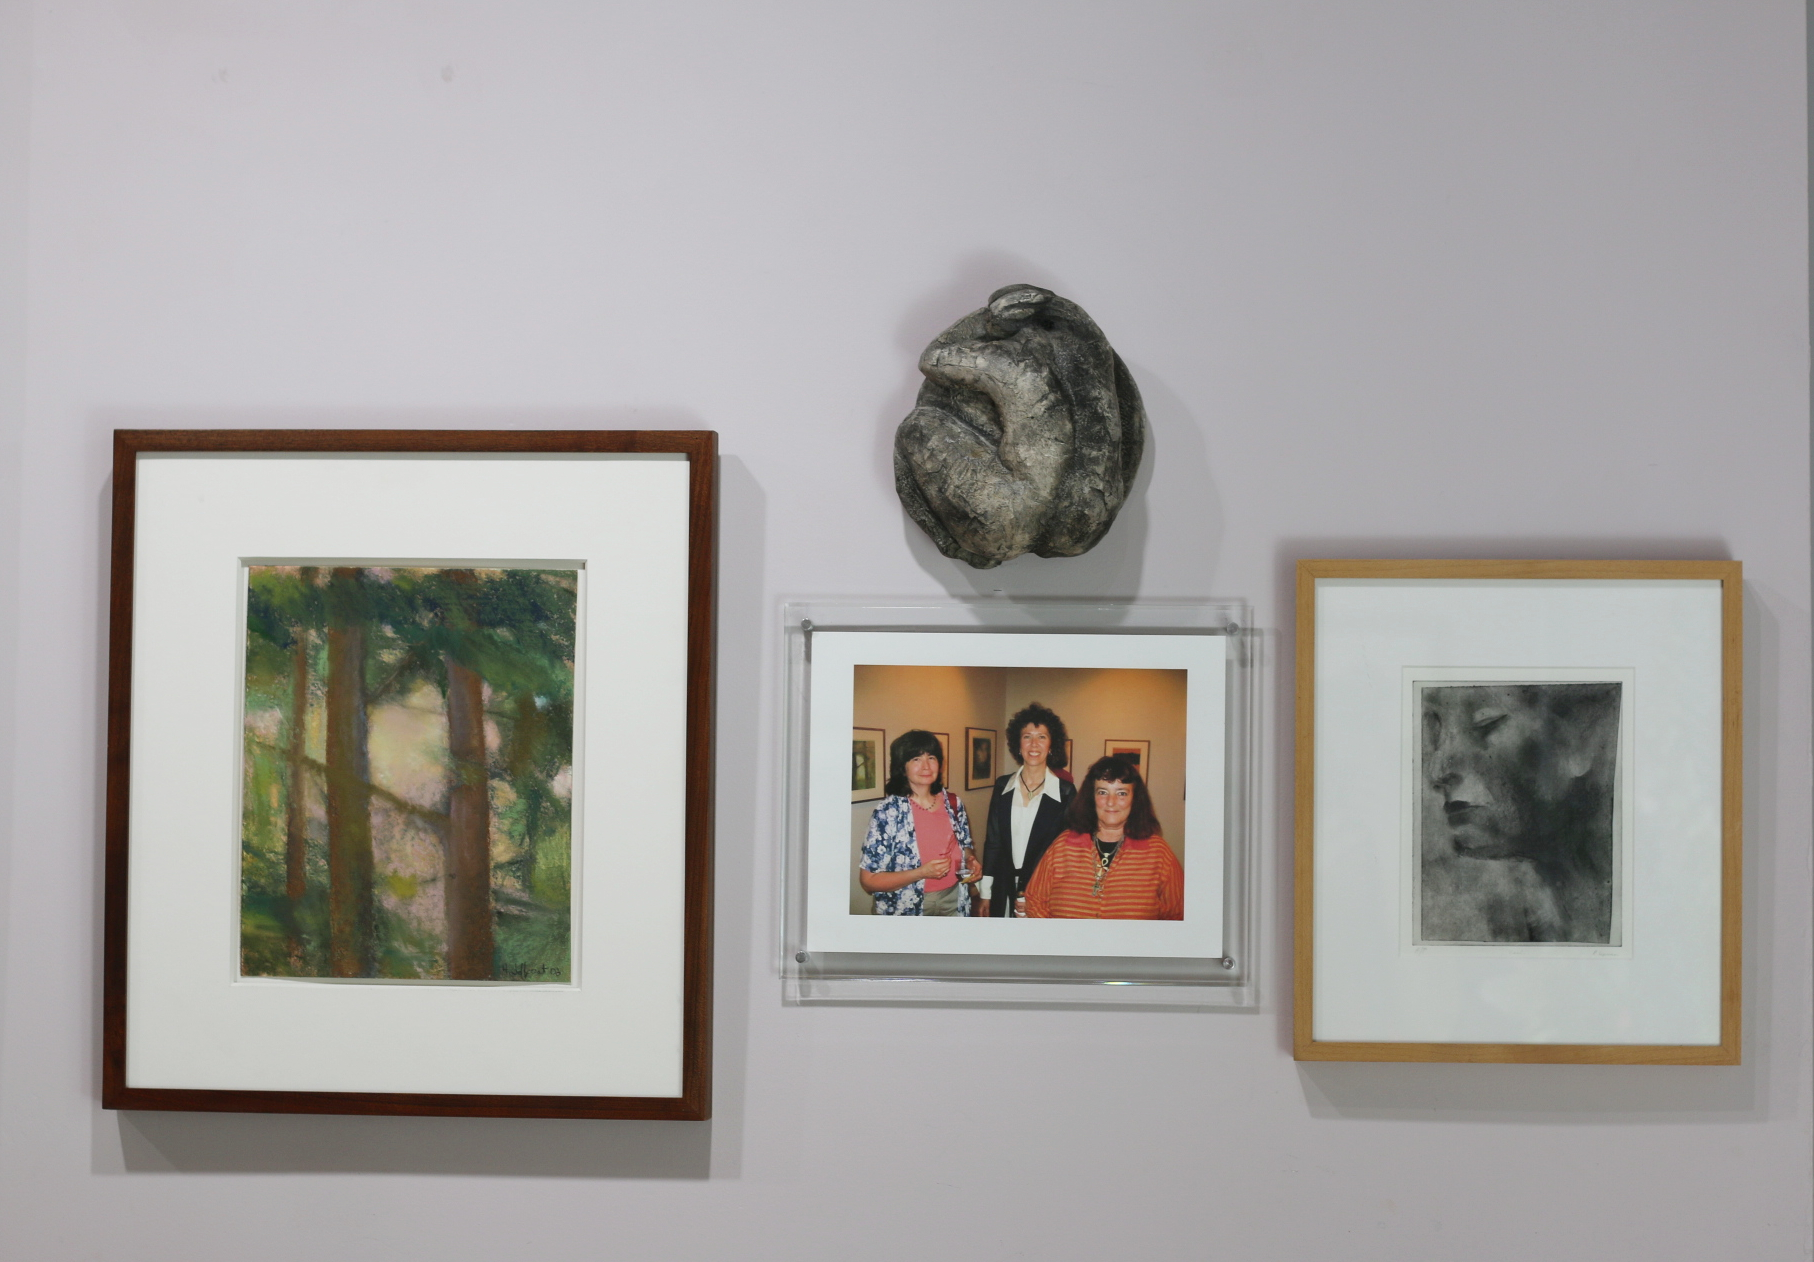 Inaugural exhibit with Hollis Jeffcoat, Deborah Masters and Patti Lipman